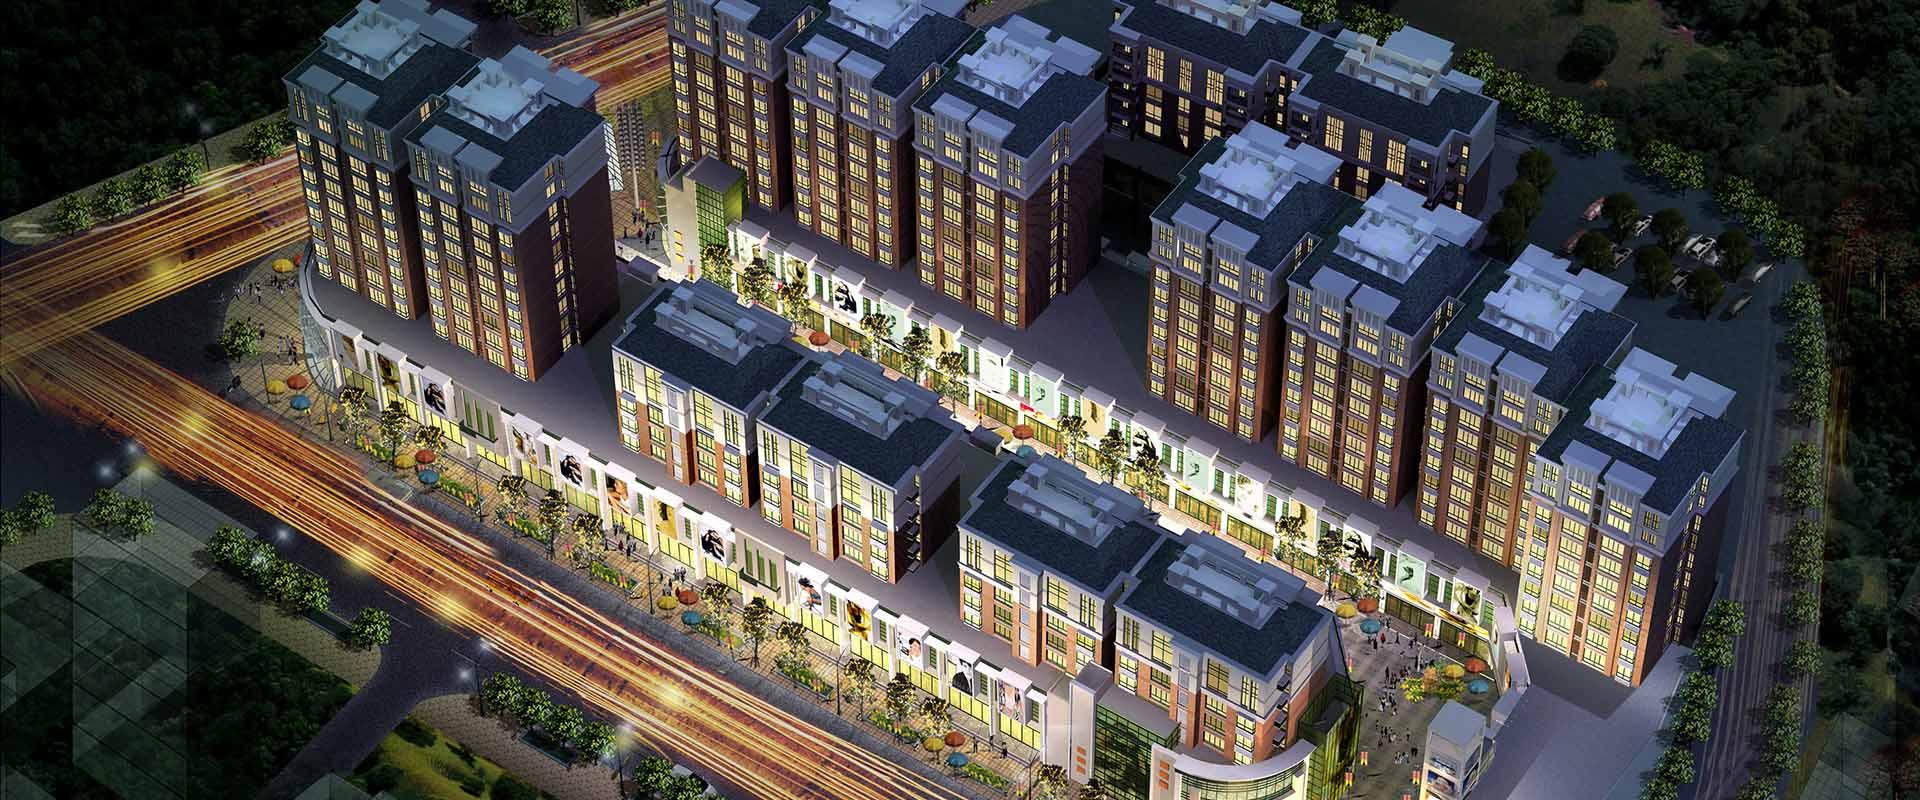 China印象位于景德镇市中心戴家弄绝版地块,周边配套完善,雄踞沃尔玛,浙江路等繁华商业中心,China印象总占地面积13854,总建筑面积3.8万,CHINA印象共7栋,由6栋住宅及一个现代化的集贸市场组成。其中包括5栋造型现代、时尚的小高层及1栋绝版的多层住宅。建筑采用框架结构,其安全性、稳定性远远大于一般多层住宅,项目主要是以住宅、商铺为主,在中心区域设置了一条500米风情商业步行街,随着建设的逐步完善,完全可以起到连接沃尔玛与浙江路的功能,China印象目前在销售的为3#、6#楼,户 型设计